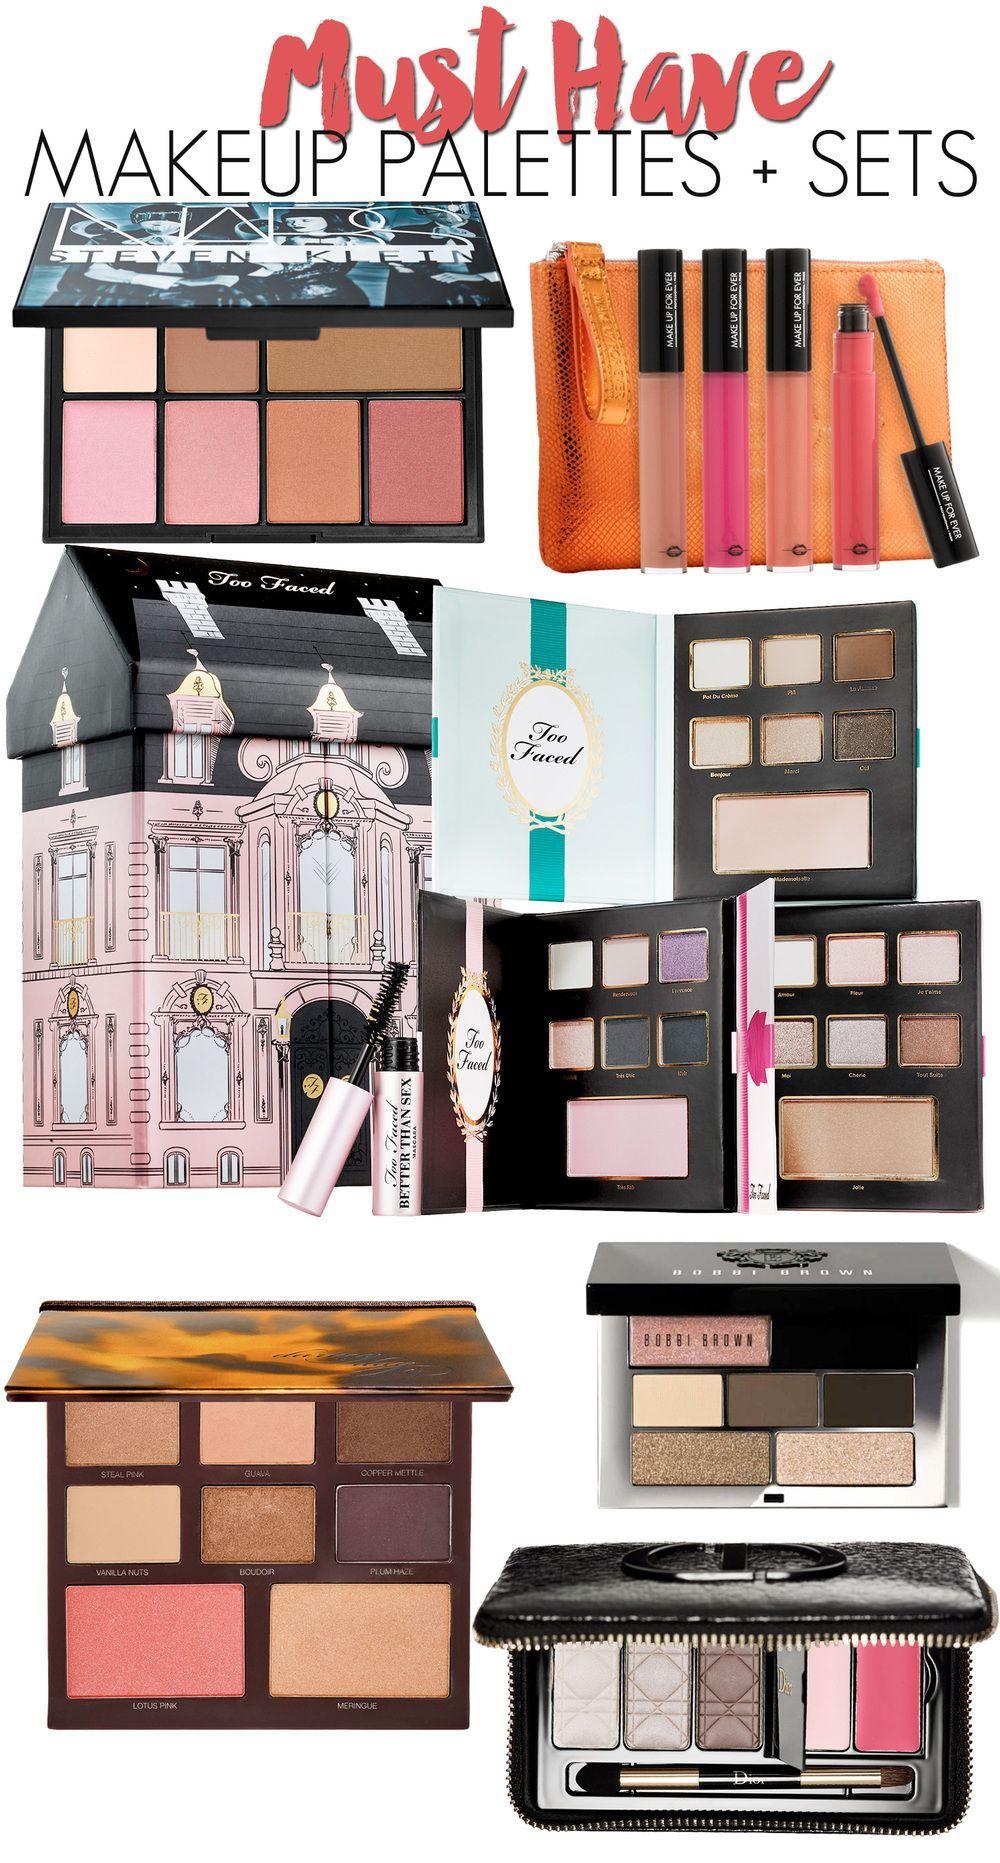 Have Makeup Palettes + Sets. Must Have Makeup Palettes + Sets for Fall + WinterMust Have Makeup Palettes + Sets for Fall + Winter